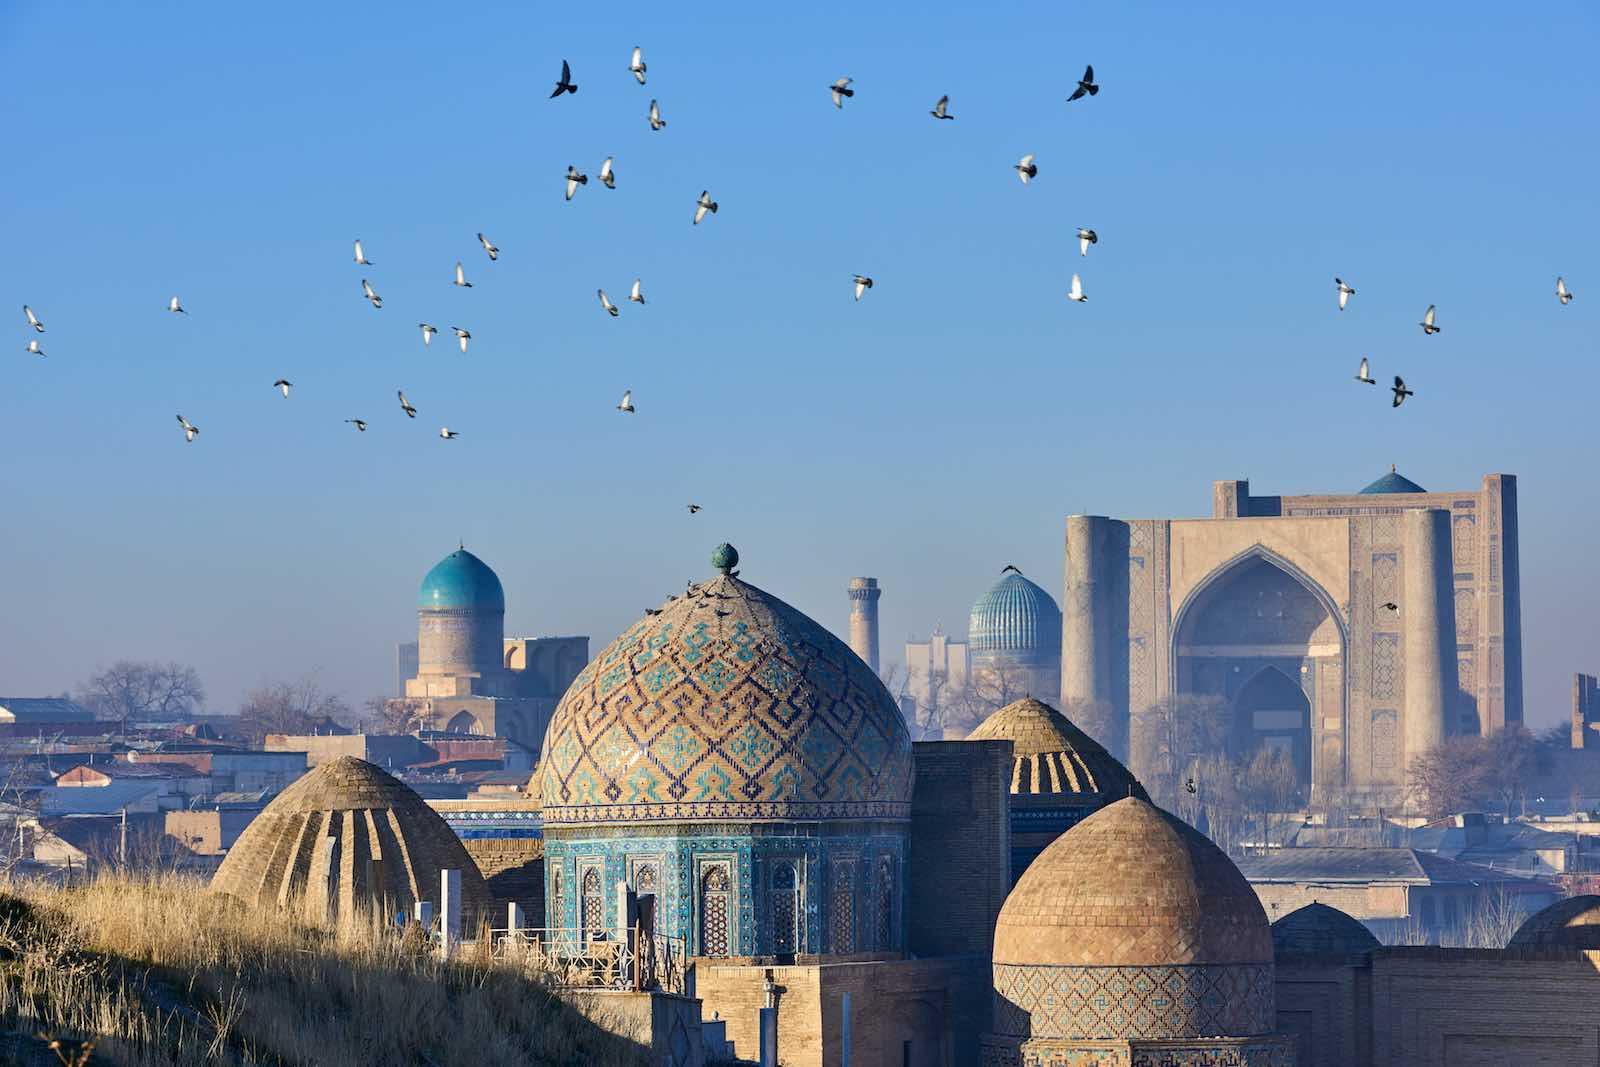 Shah-i-Zinda necropolis in Samarkand, Uzbekistan (Getty Images)